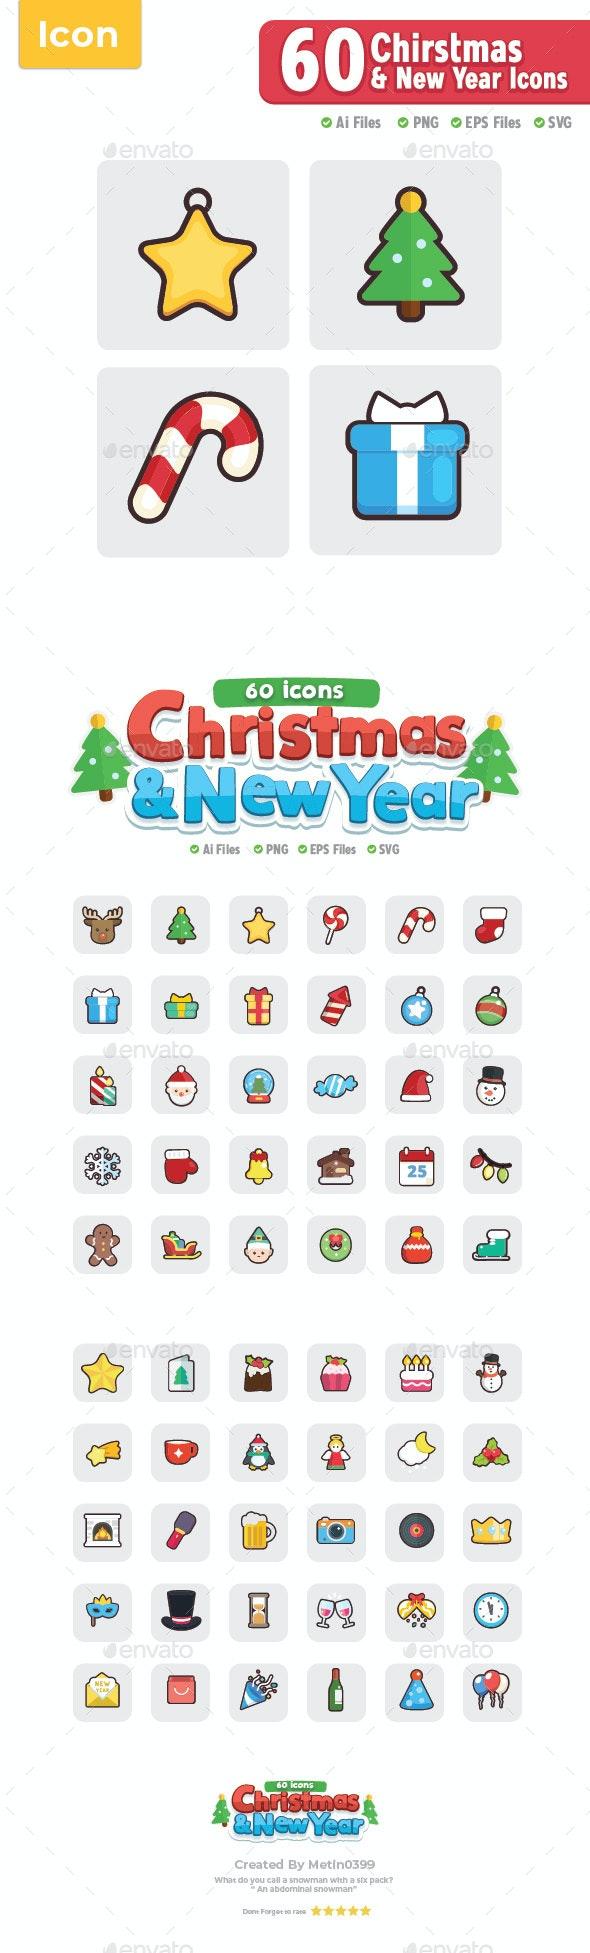 60 Icons Chirstmas - Seasonal Icons